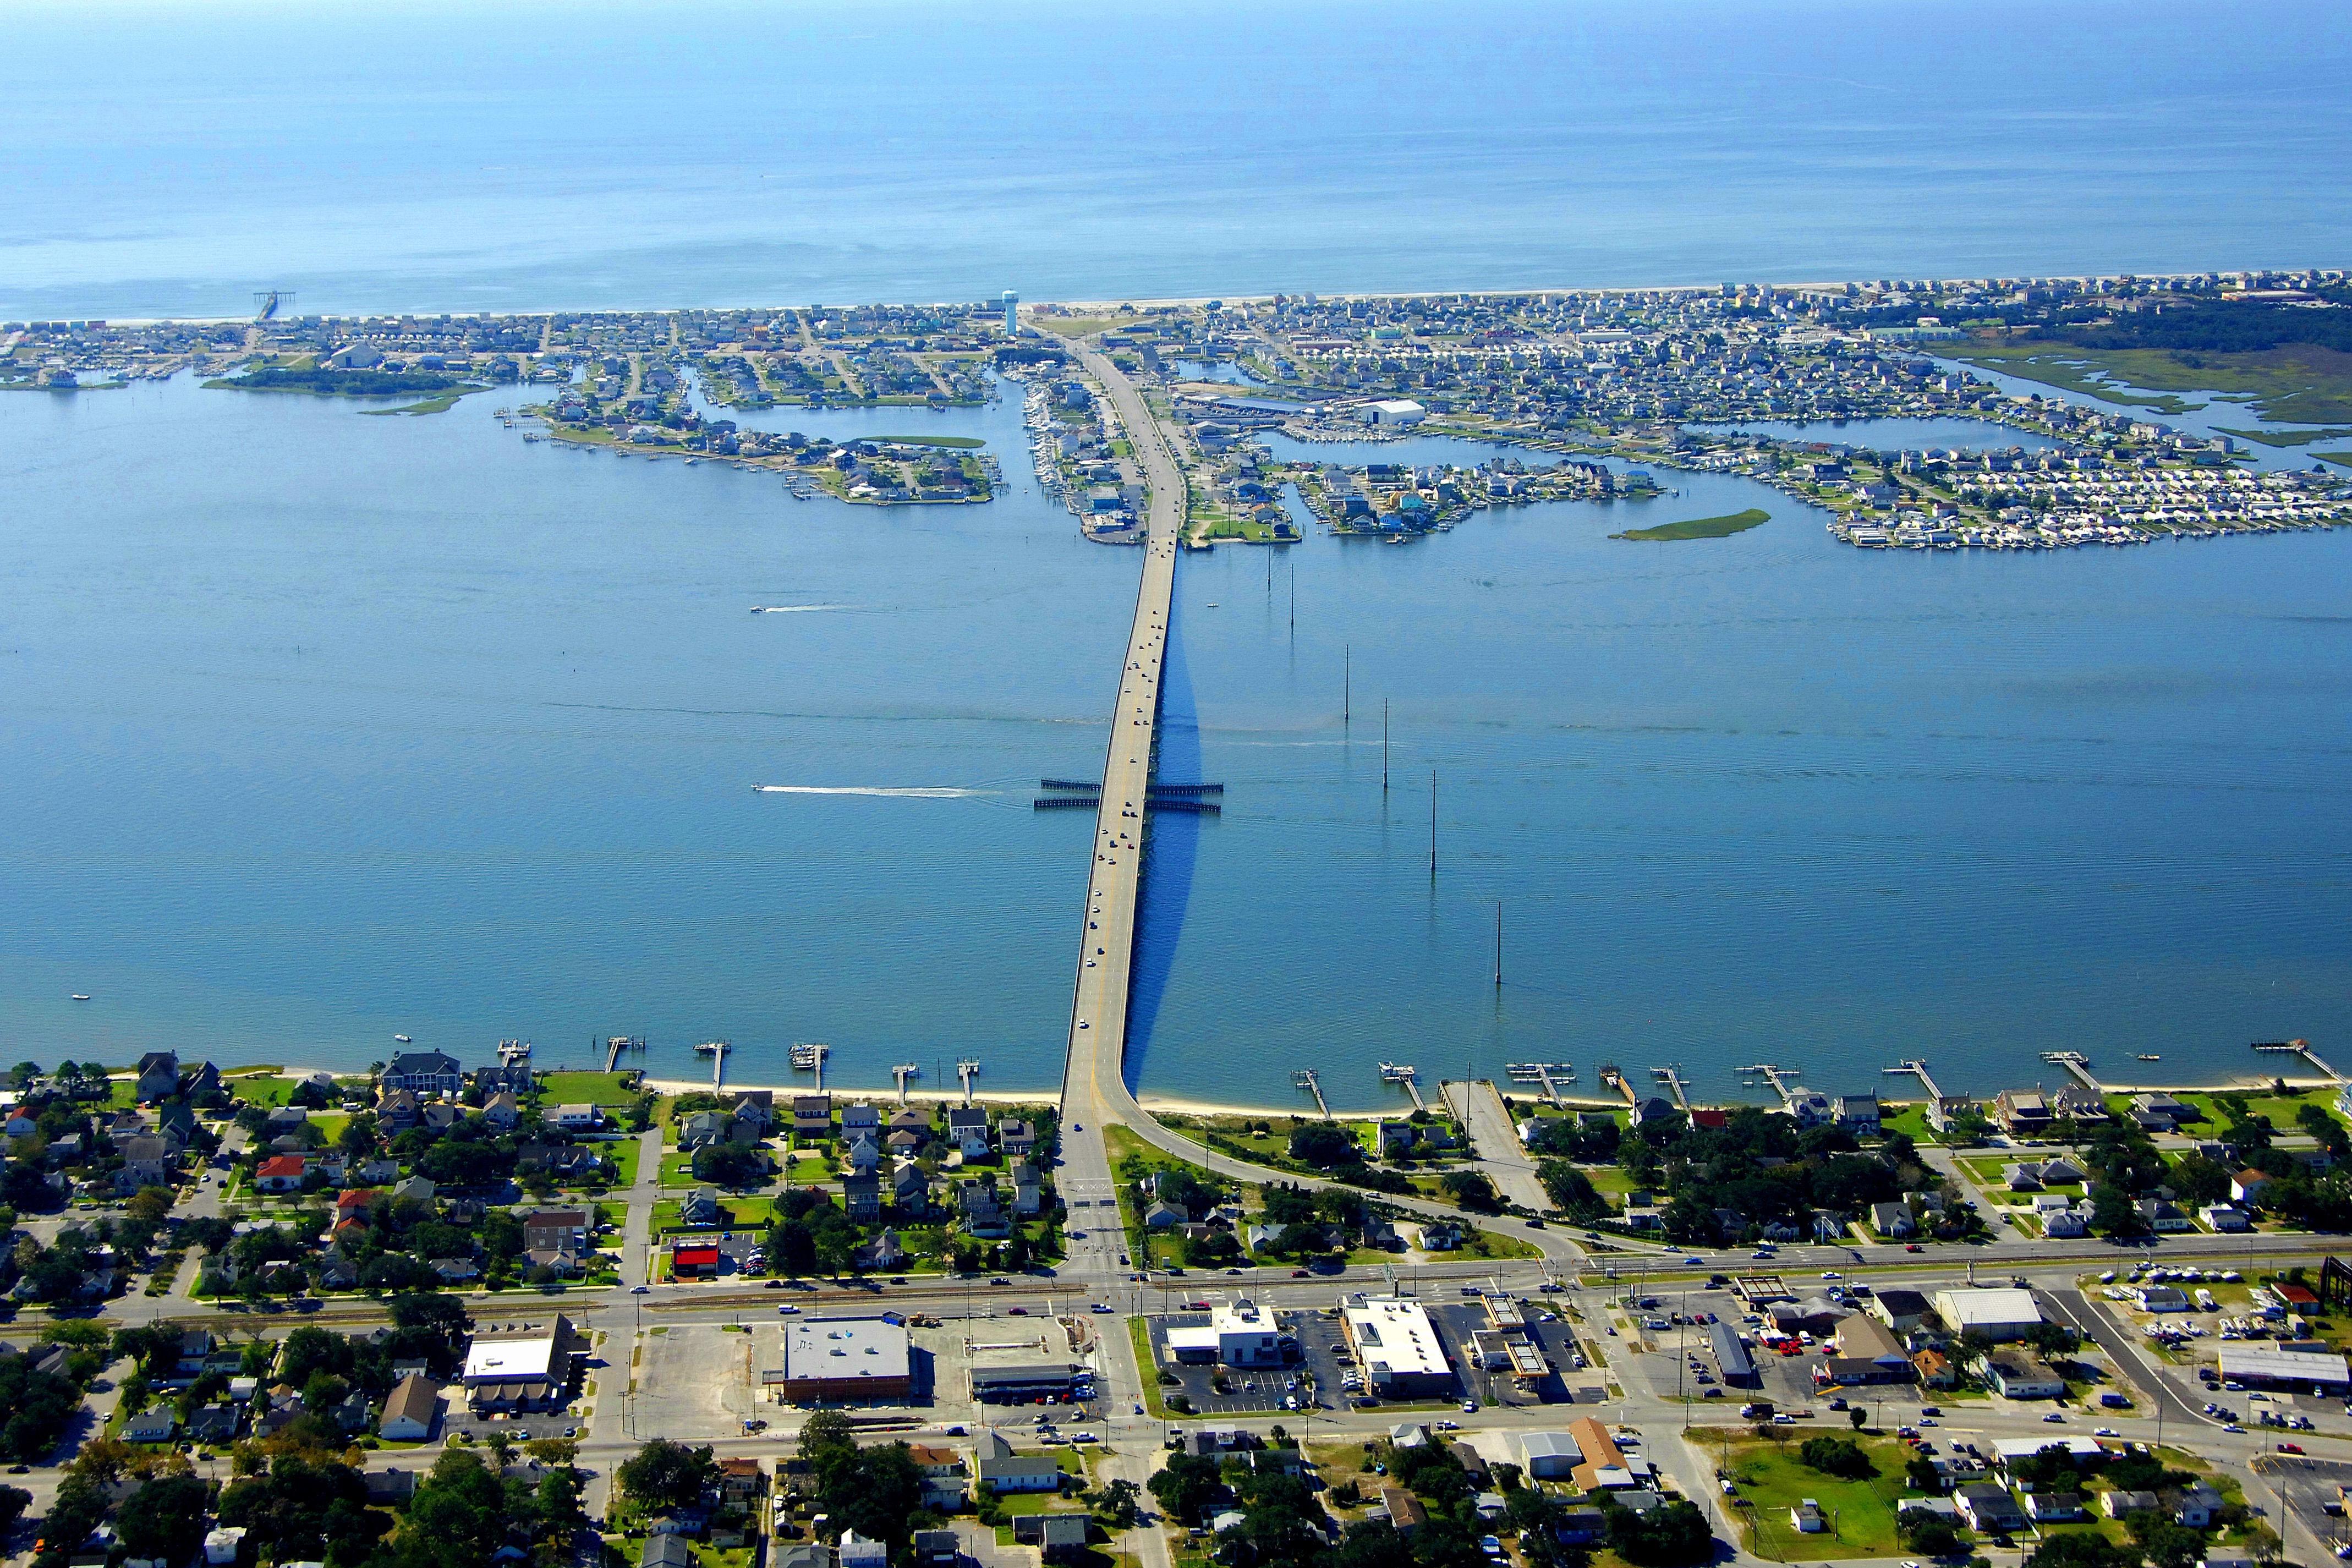 File:Morehead City, NC.jpg - Wikipedia